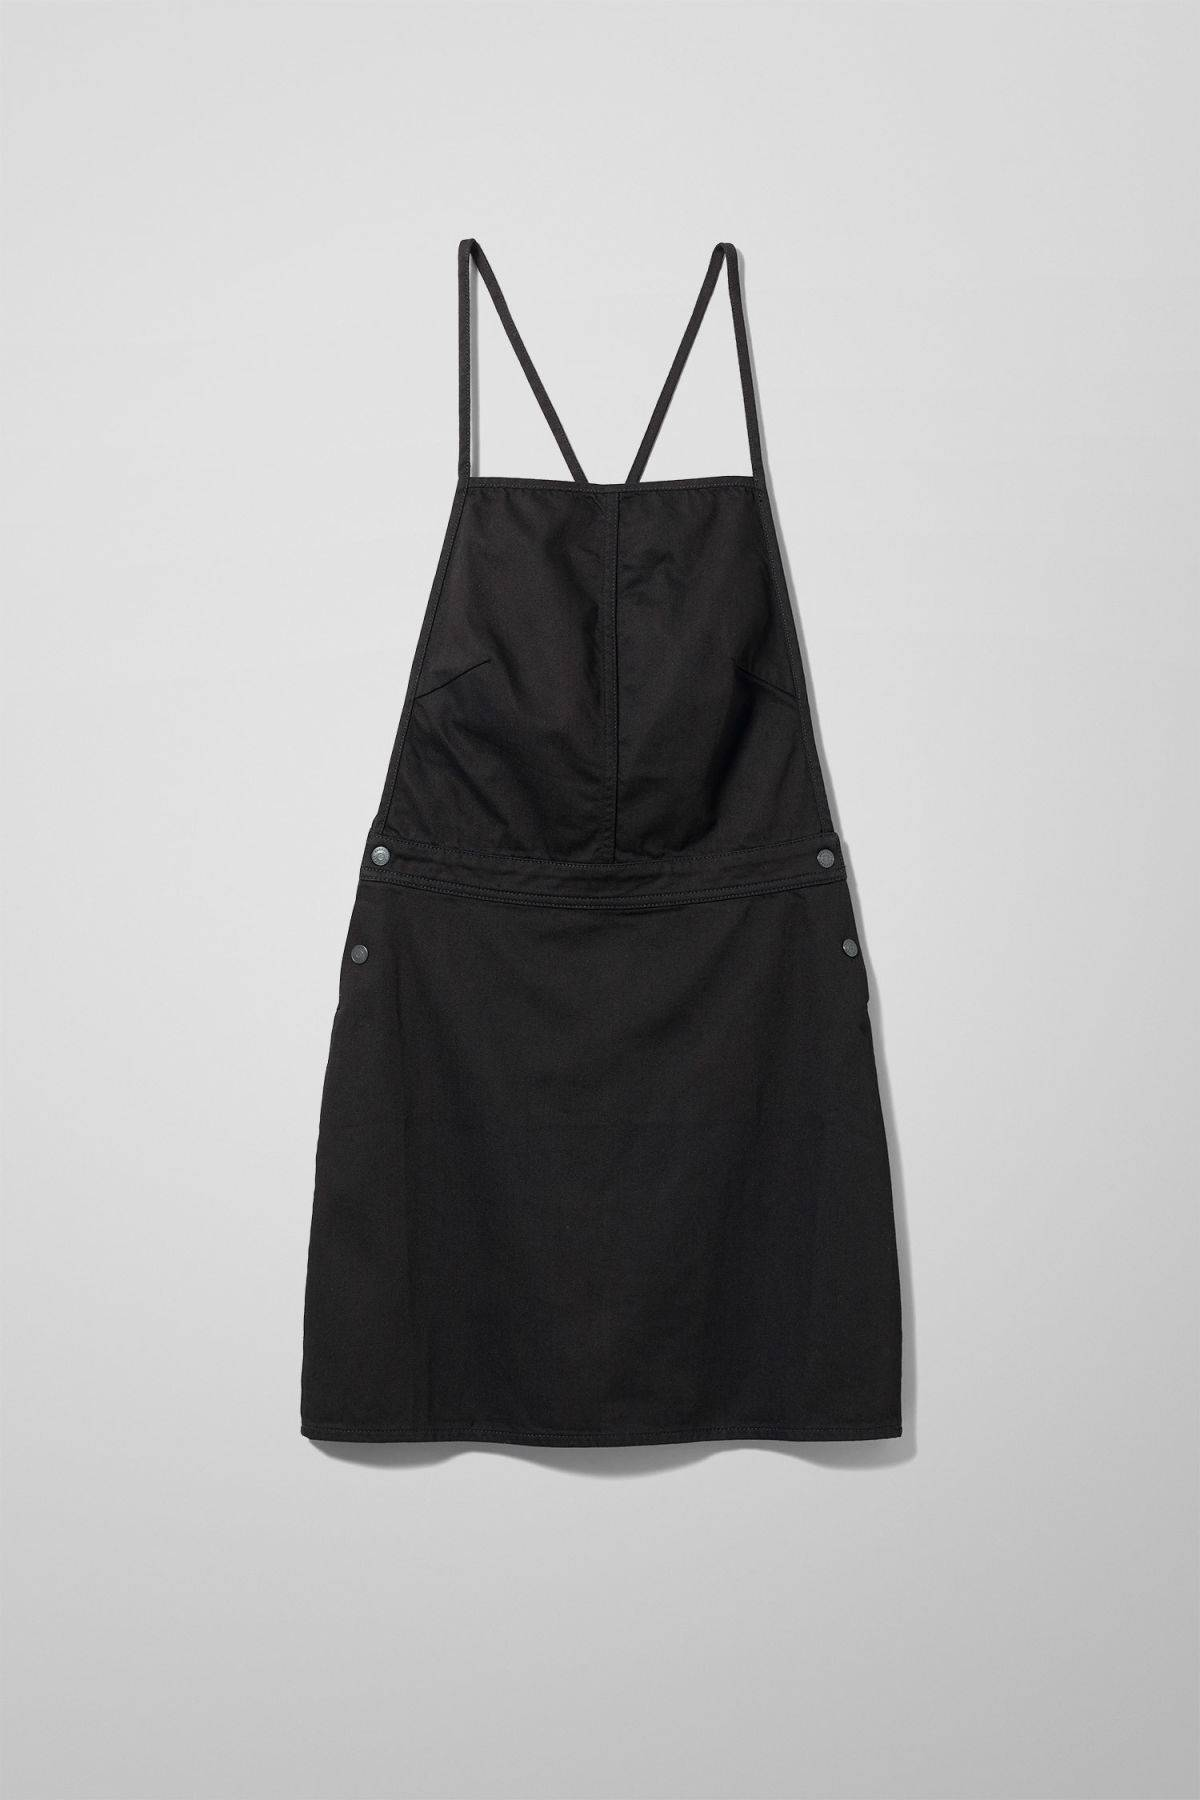 Image of Irene Denim Dress Washed Black - Black-38